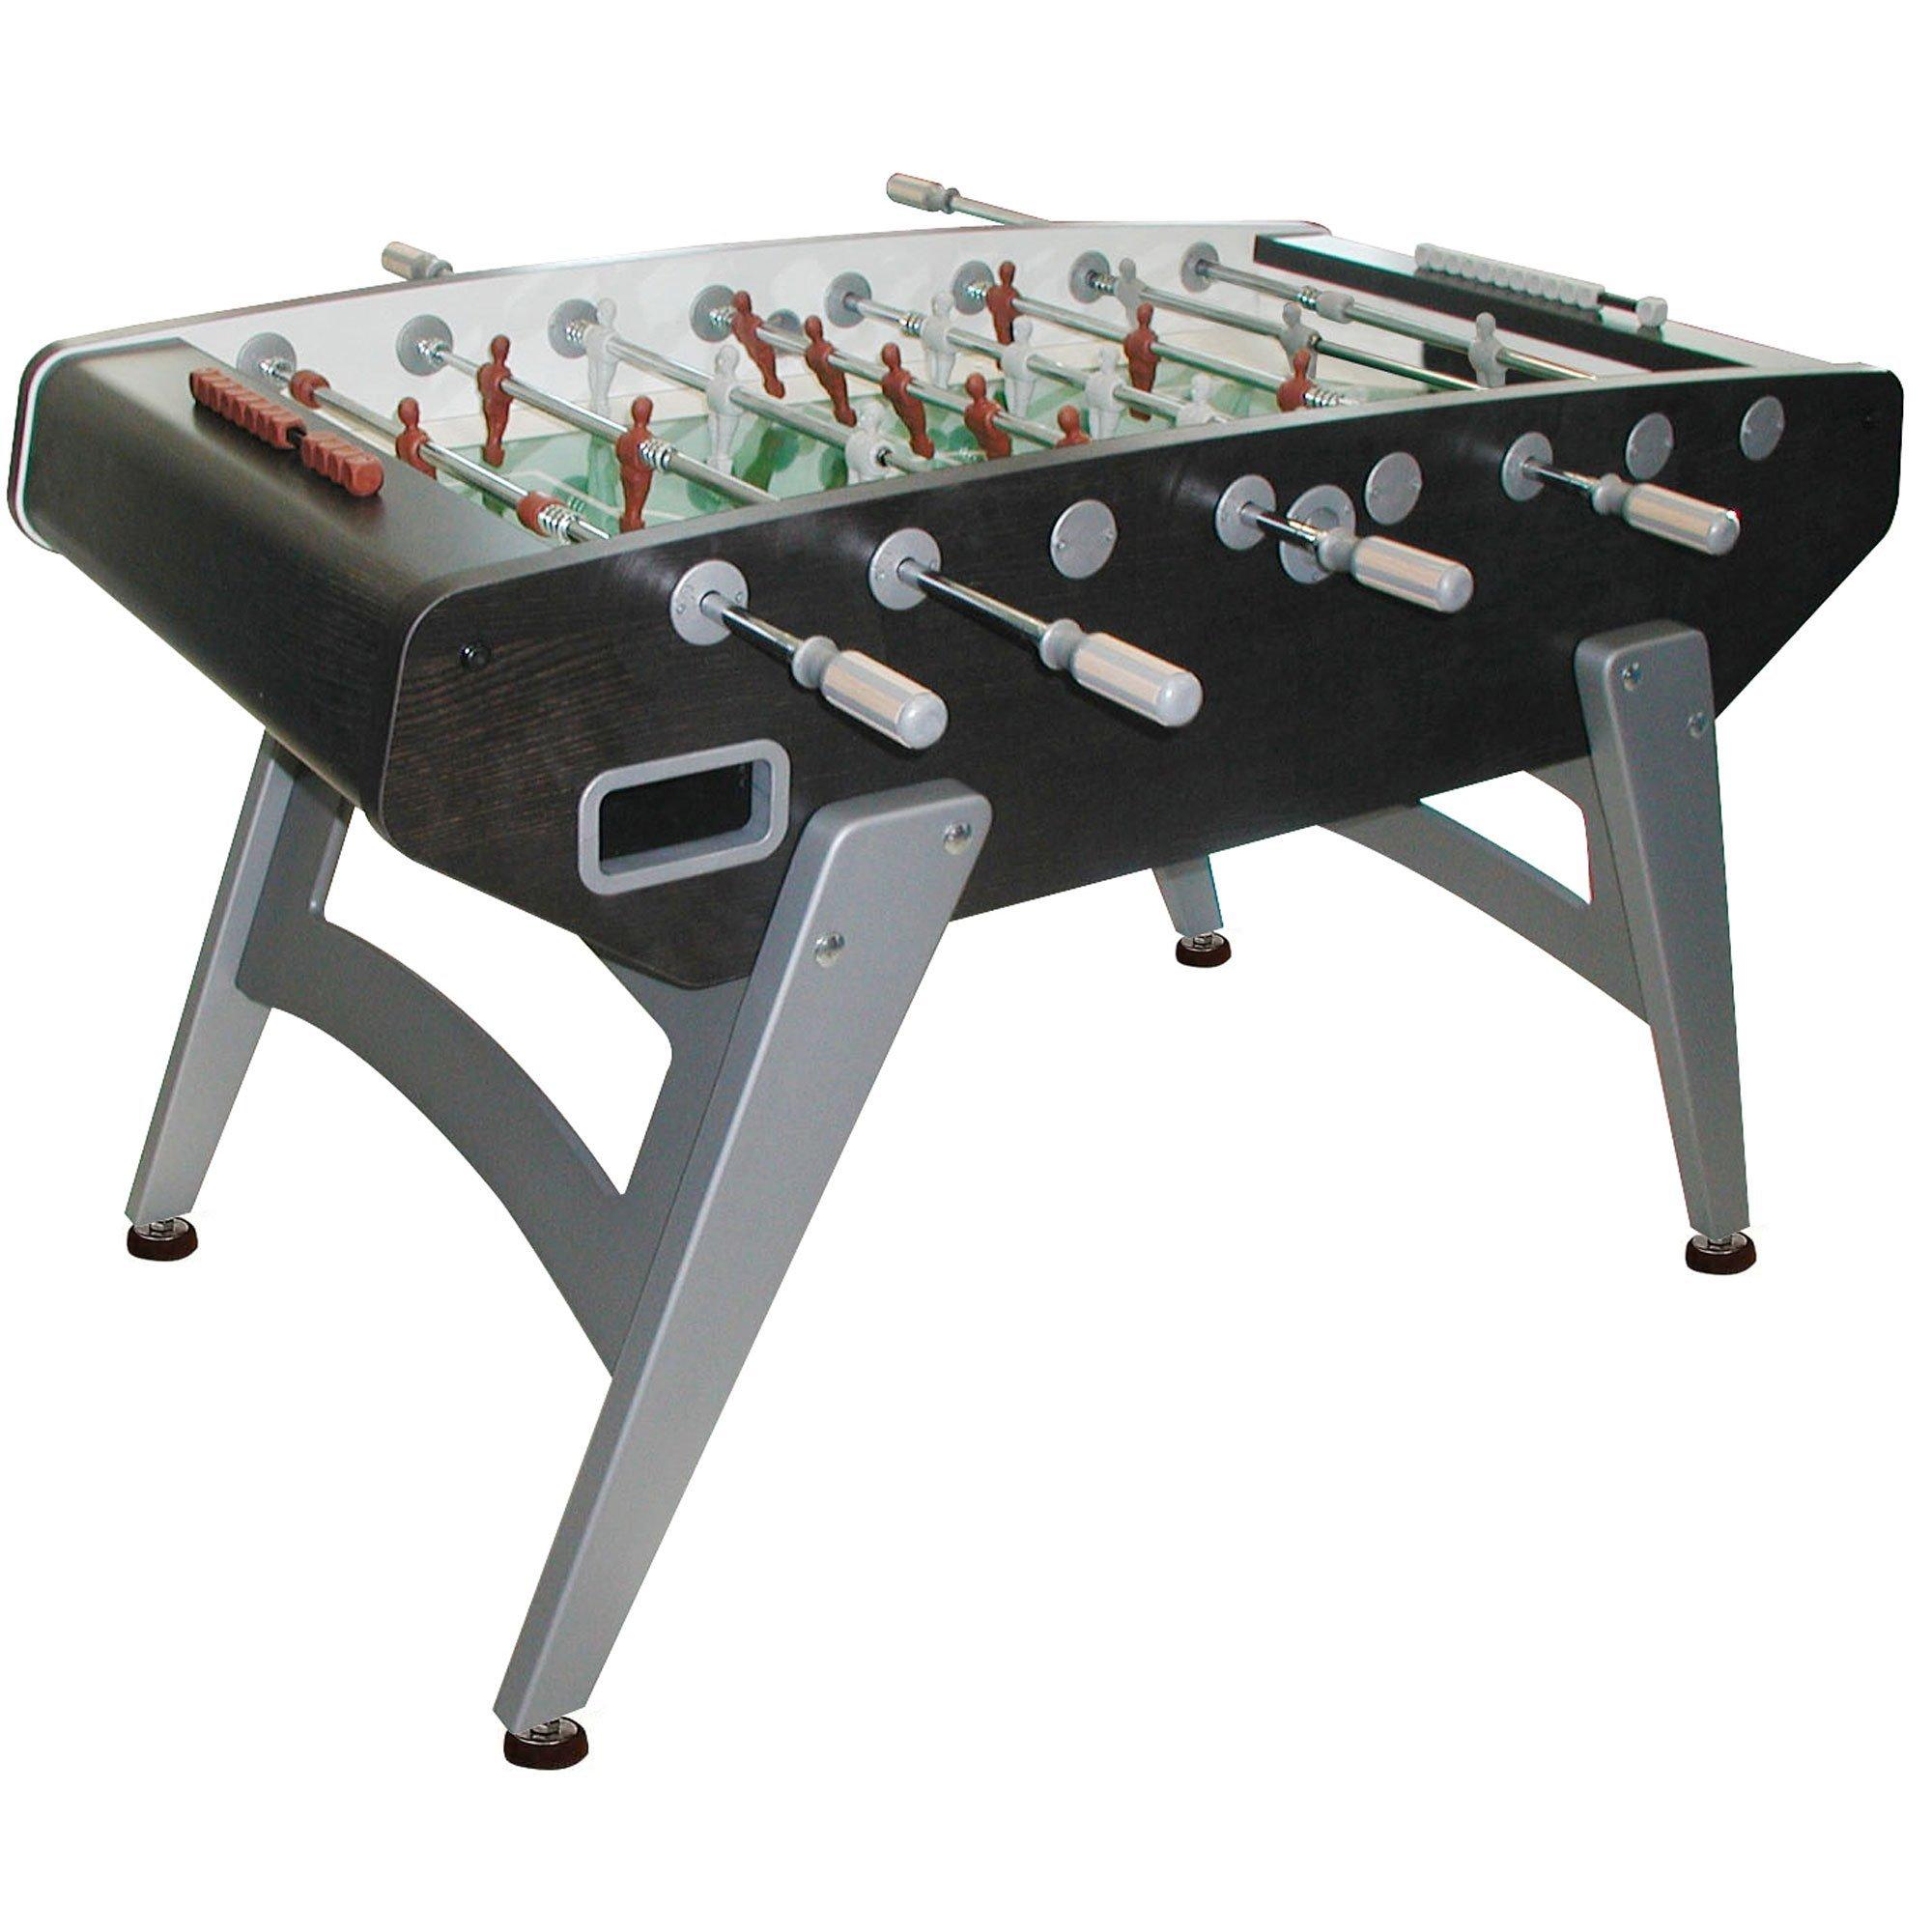 Get Quotations · Garlando G 5000 Indoor Foosball Table With Telescopic  Rods, Slanted Legs, Abacus Scorers